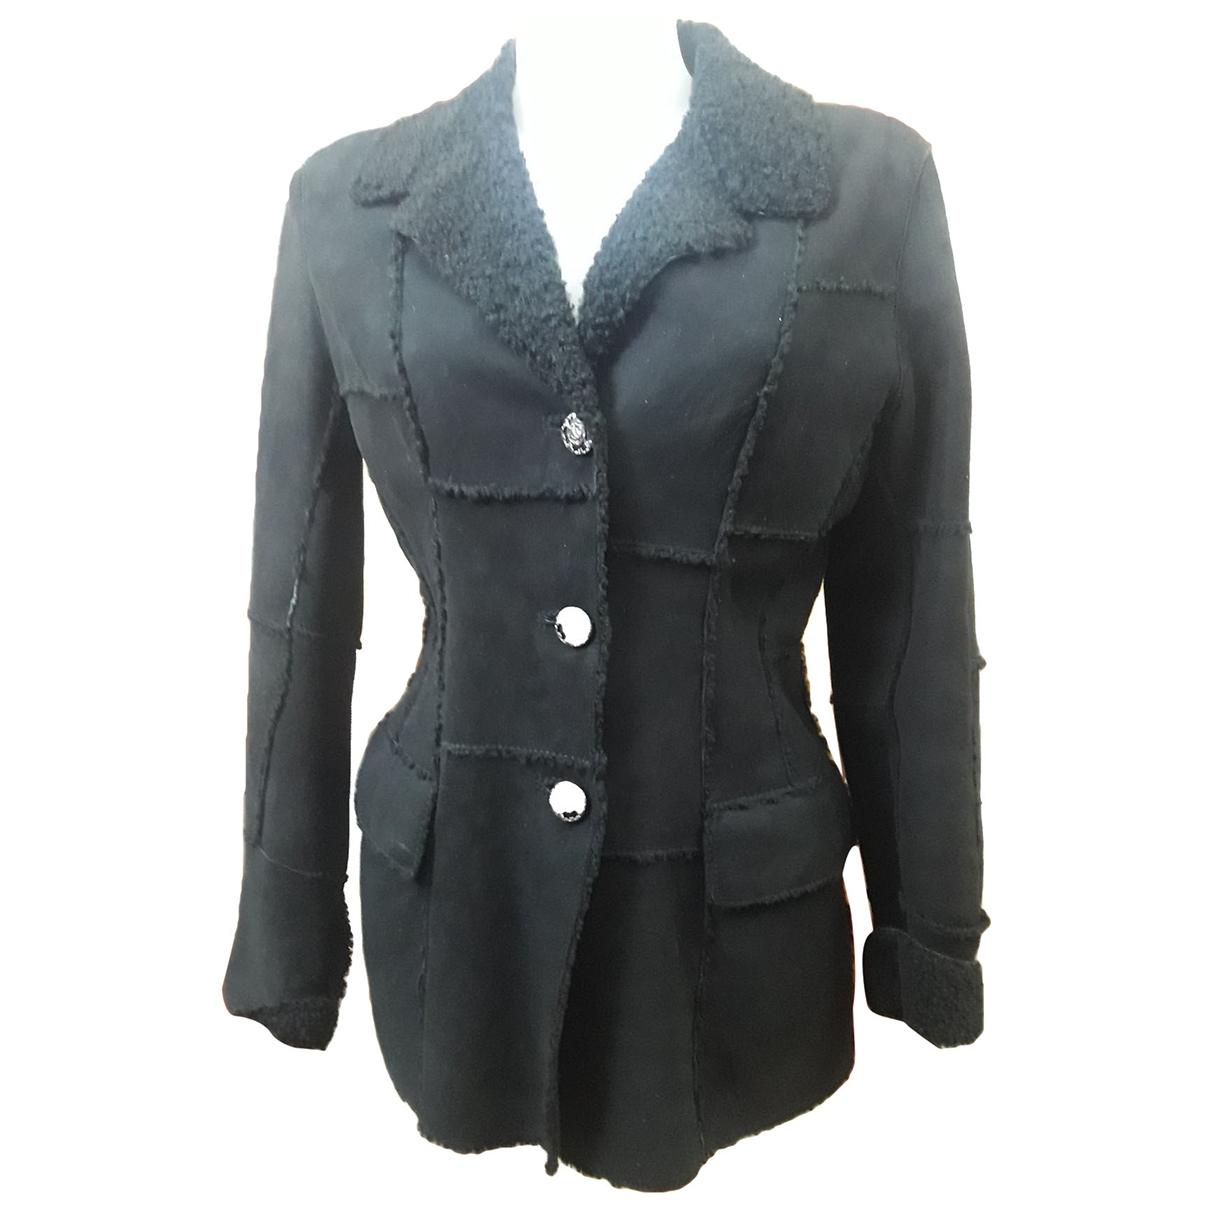 Roberto Cavalli \N Black Shearling Leather jacket for Women M International